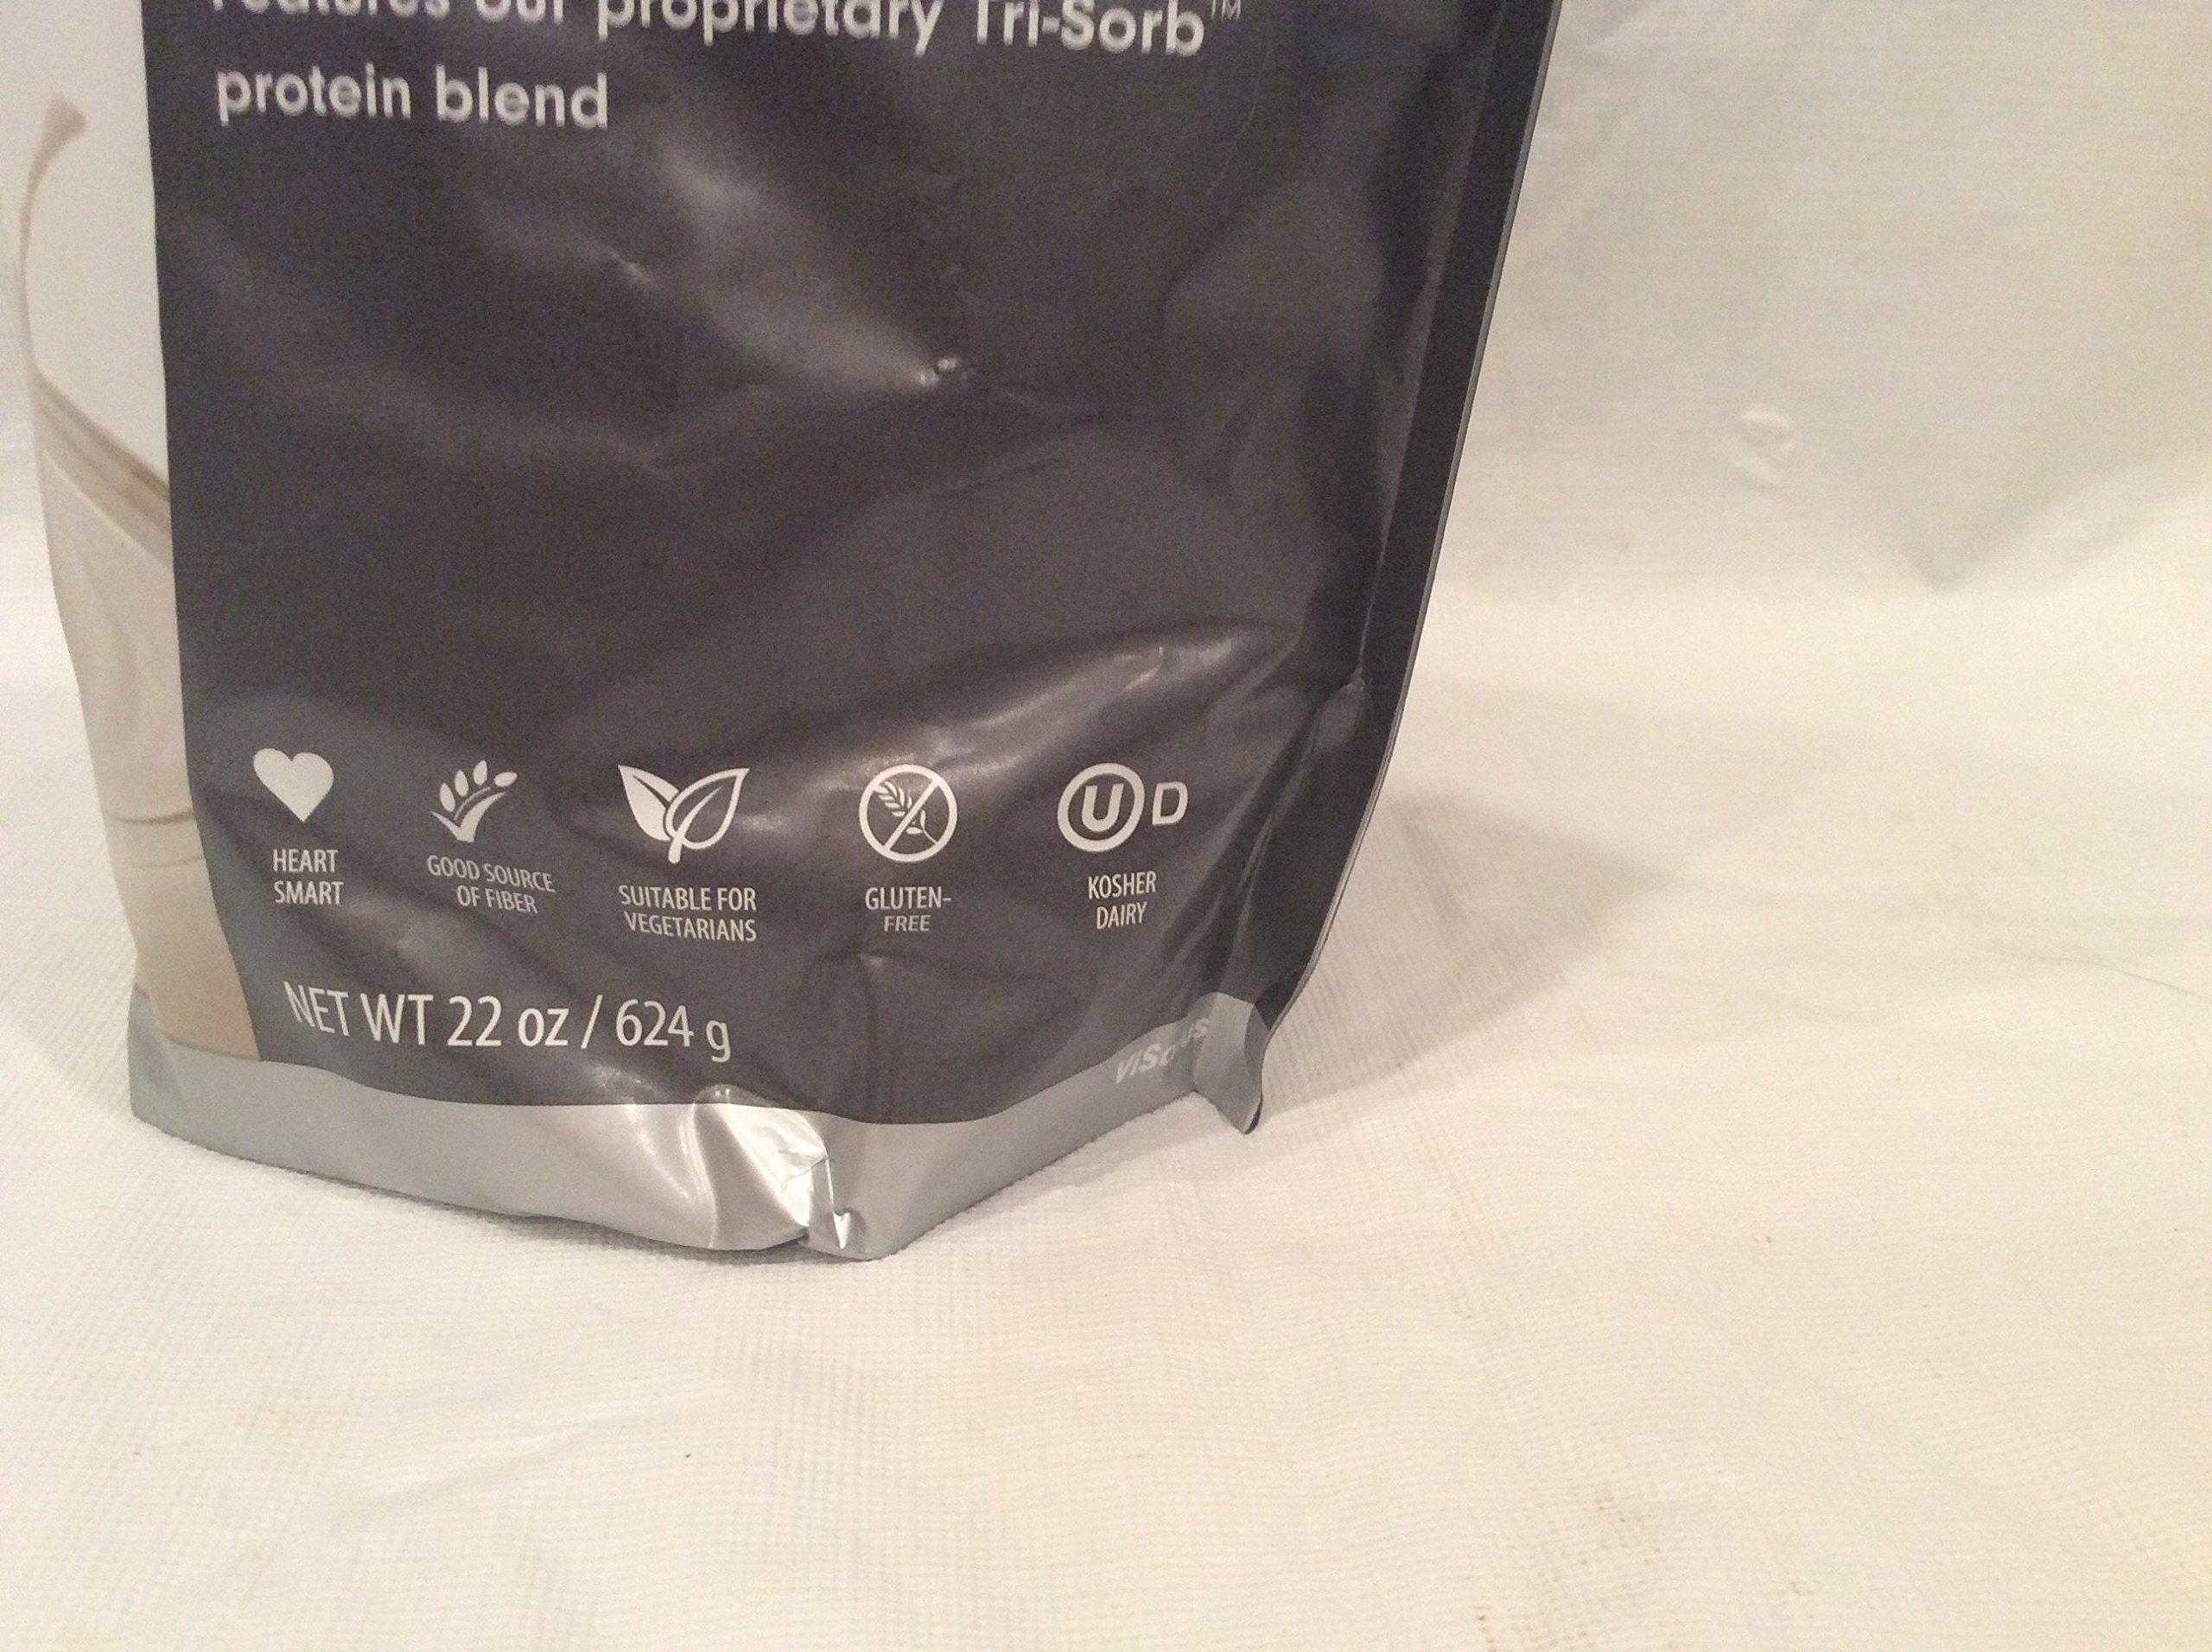 Visalus VI-Shape Nutritional Shake Mix Sweet Cream Flavor 22 Ounces (2 Bags) by ViSalus